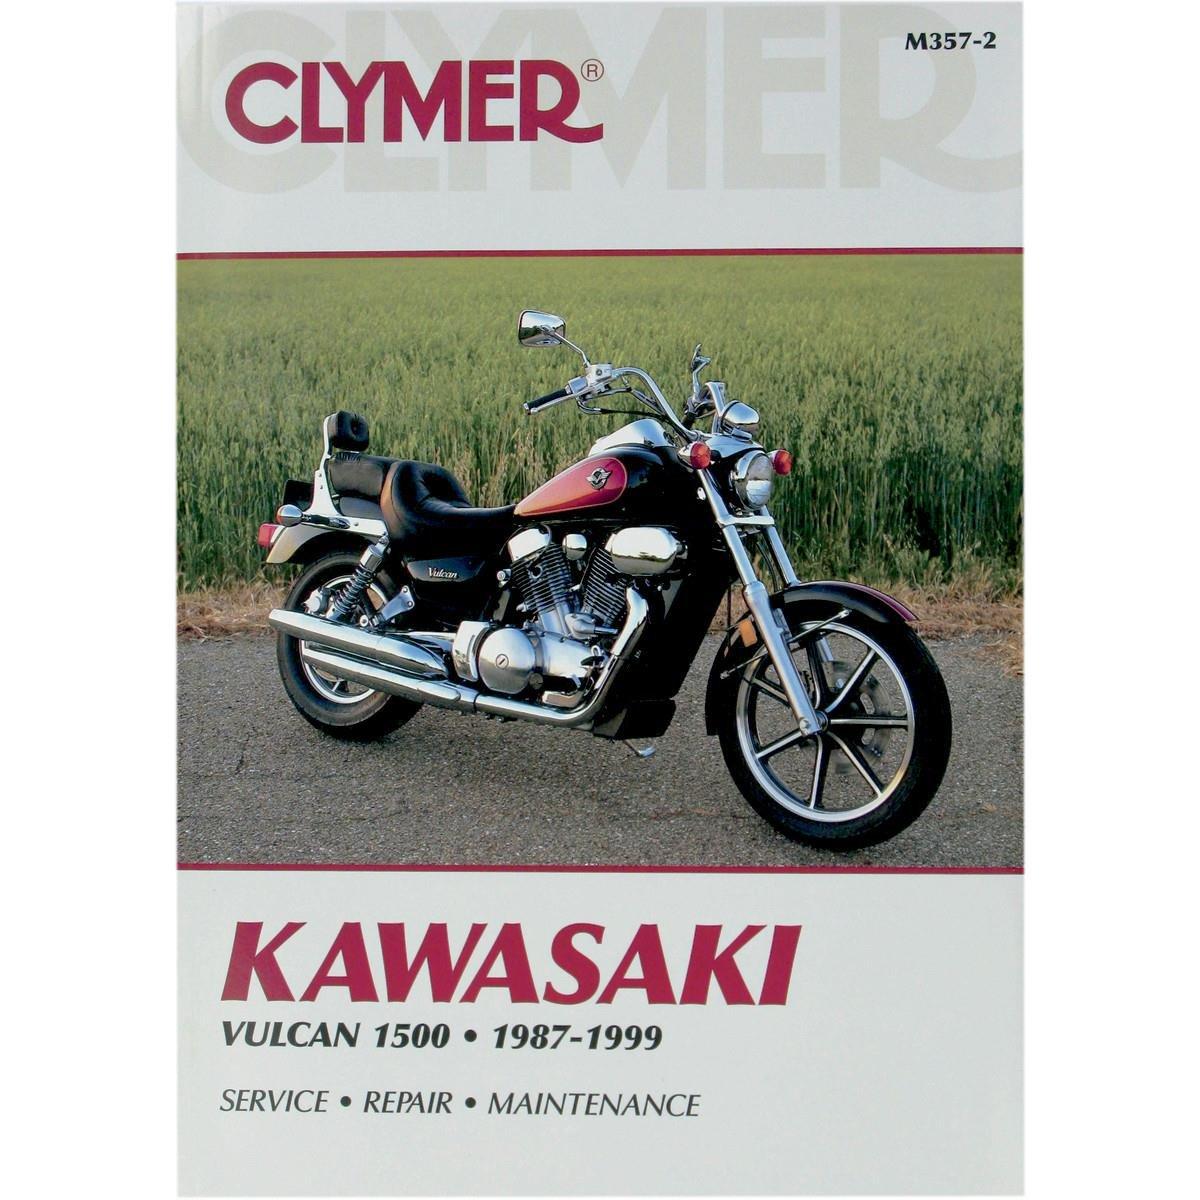 Amazon.com: 1987-1999 Kawasaki VN1500 Vulcan CLYMER MANUAL KAW VN1500 VULCAN  87-99, Manufacturer: CLYMER, Manufacturer Part Number: M3572-AD, ...